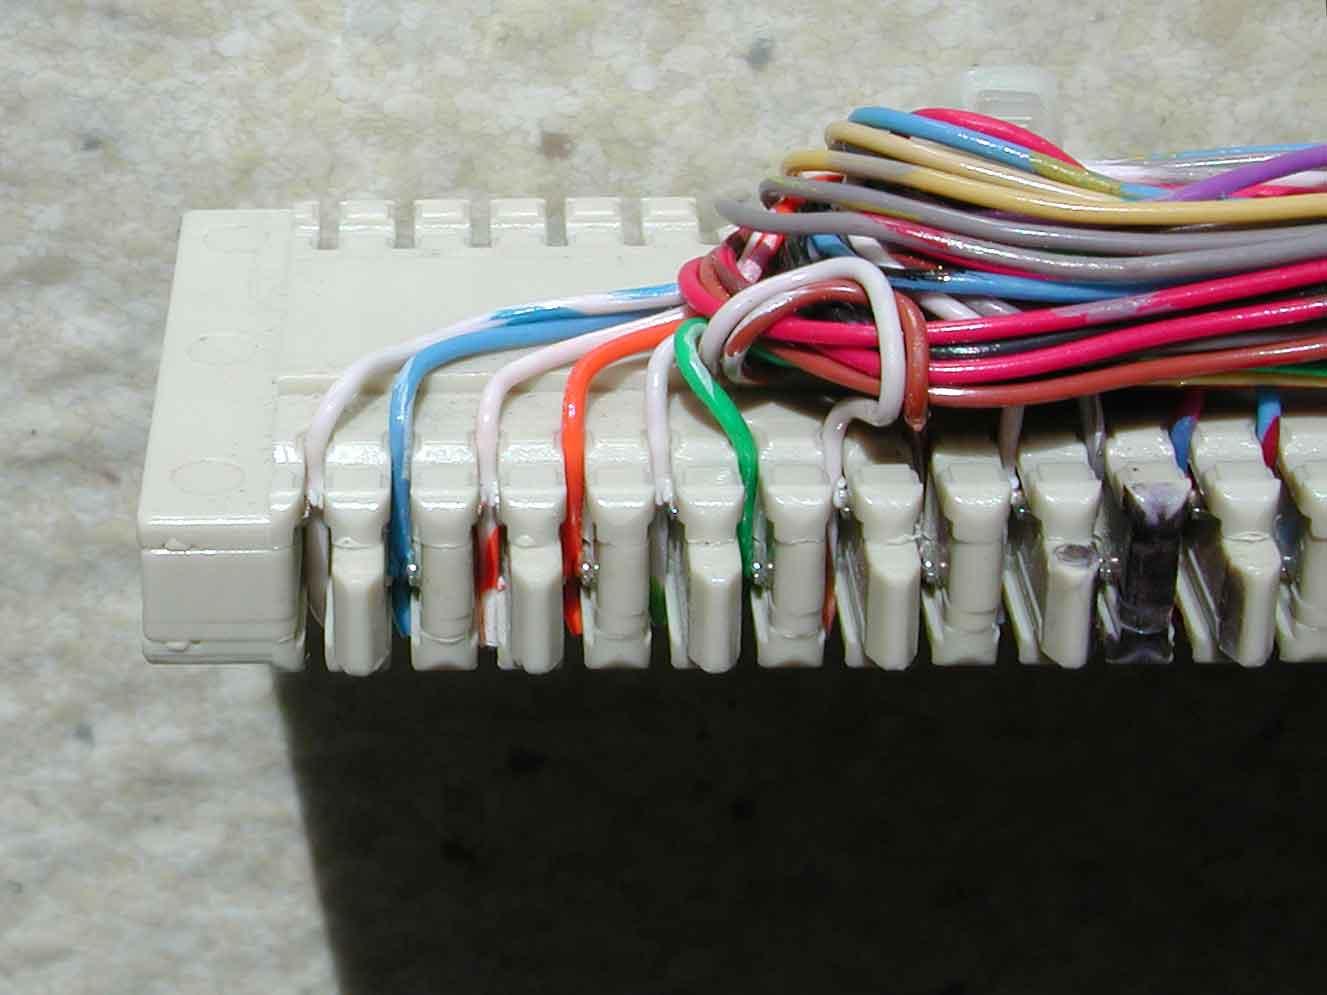 110 Punch Block Wiring Diagram Data Communications Equipment